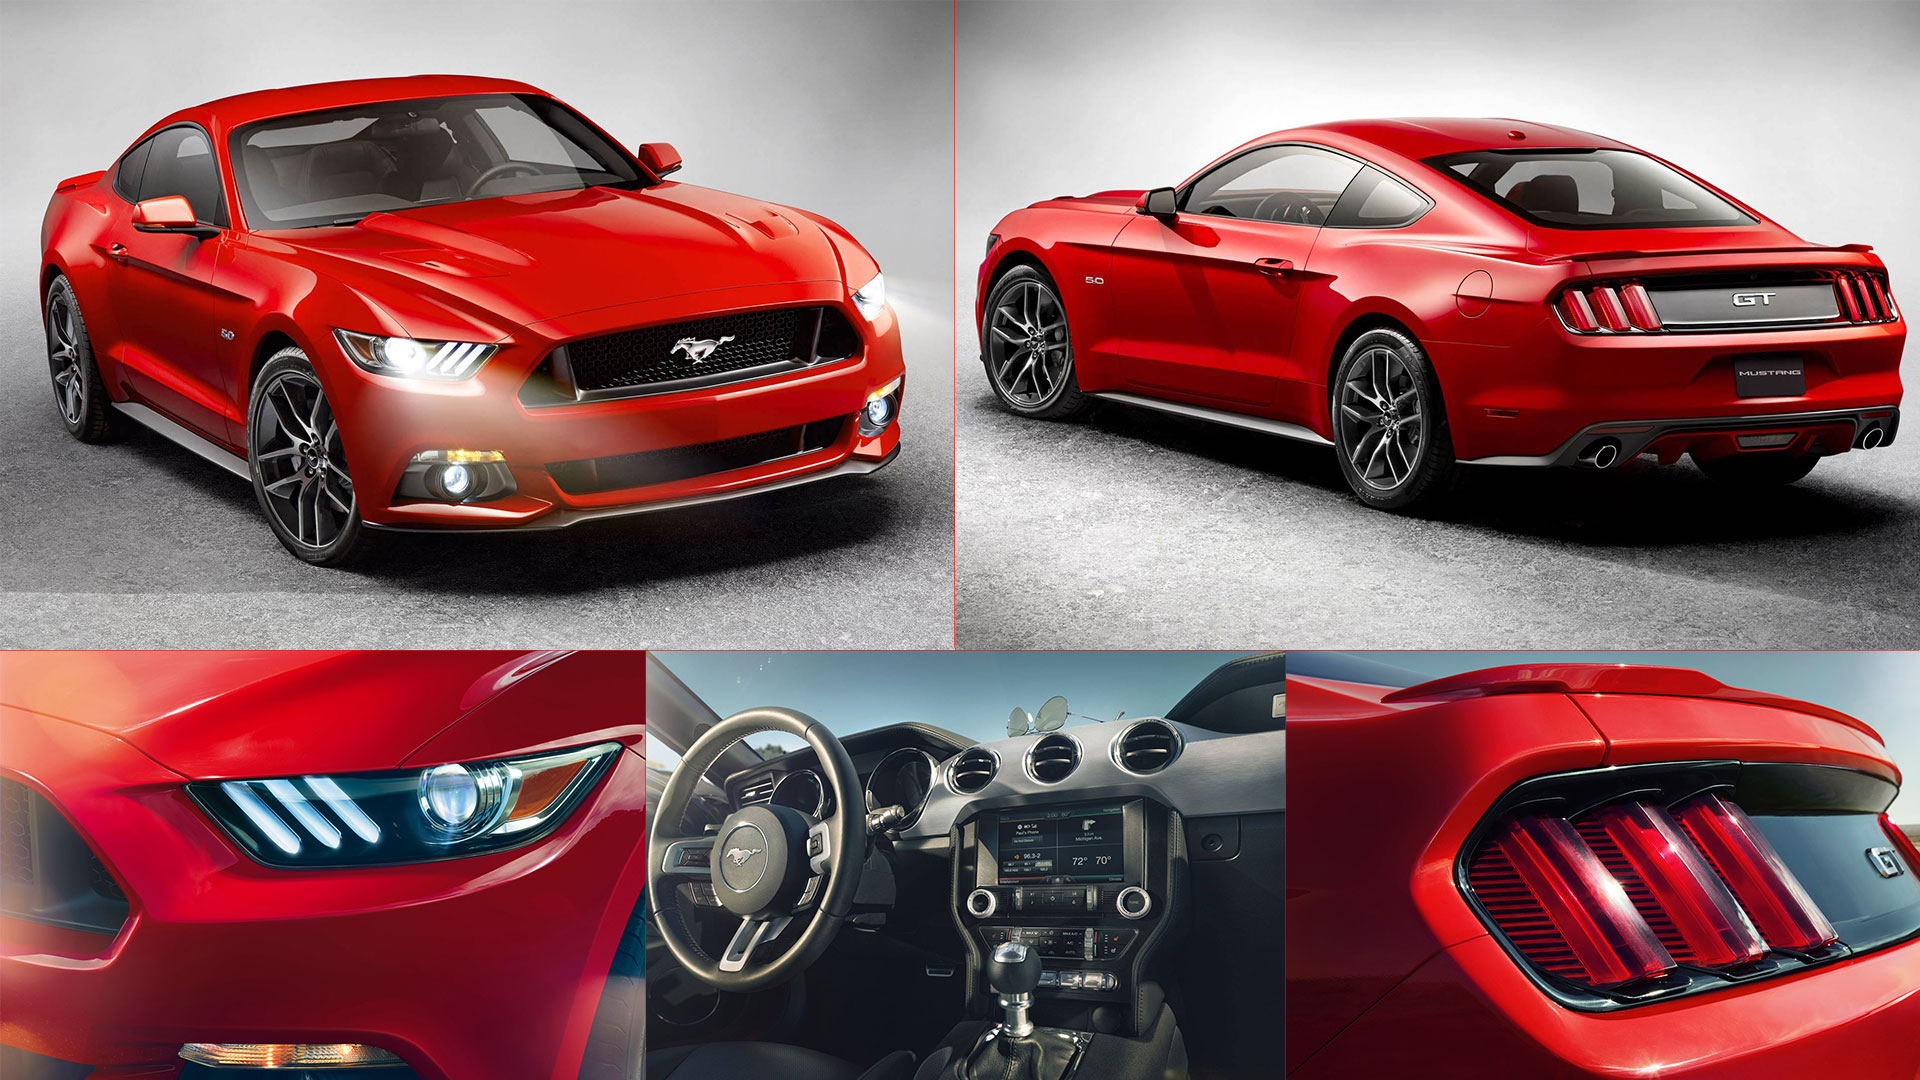 2015 Ford Mustang HD Desktop Wallpaper 1920x1080